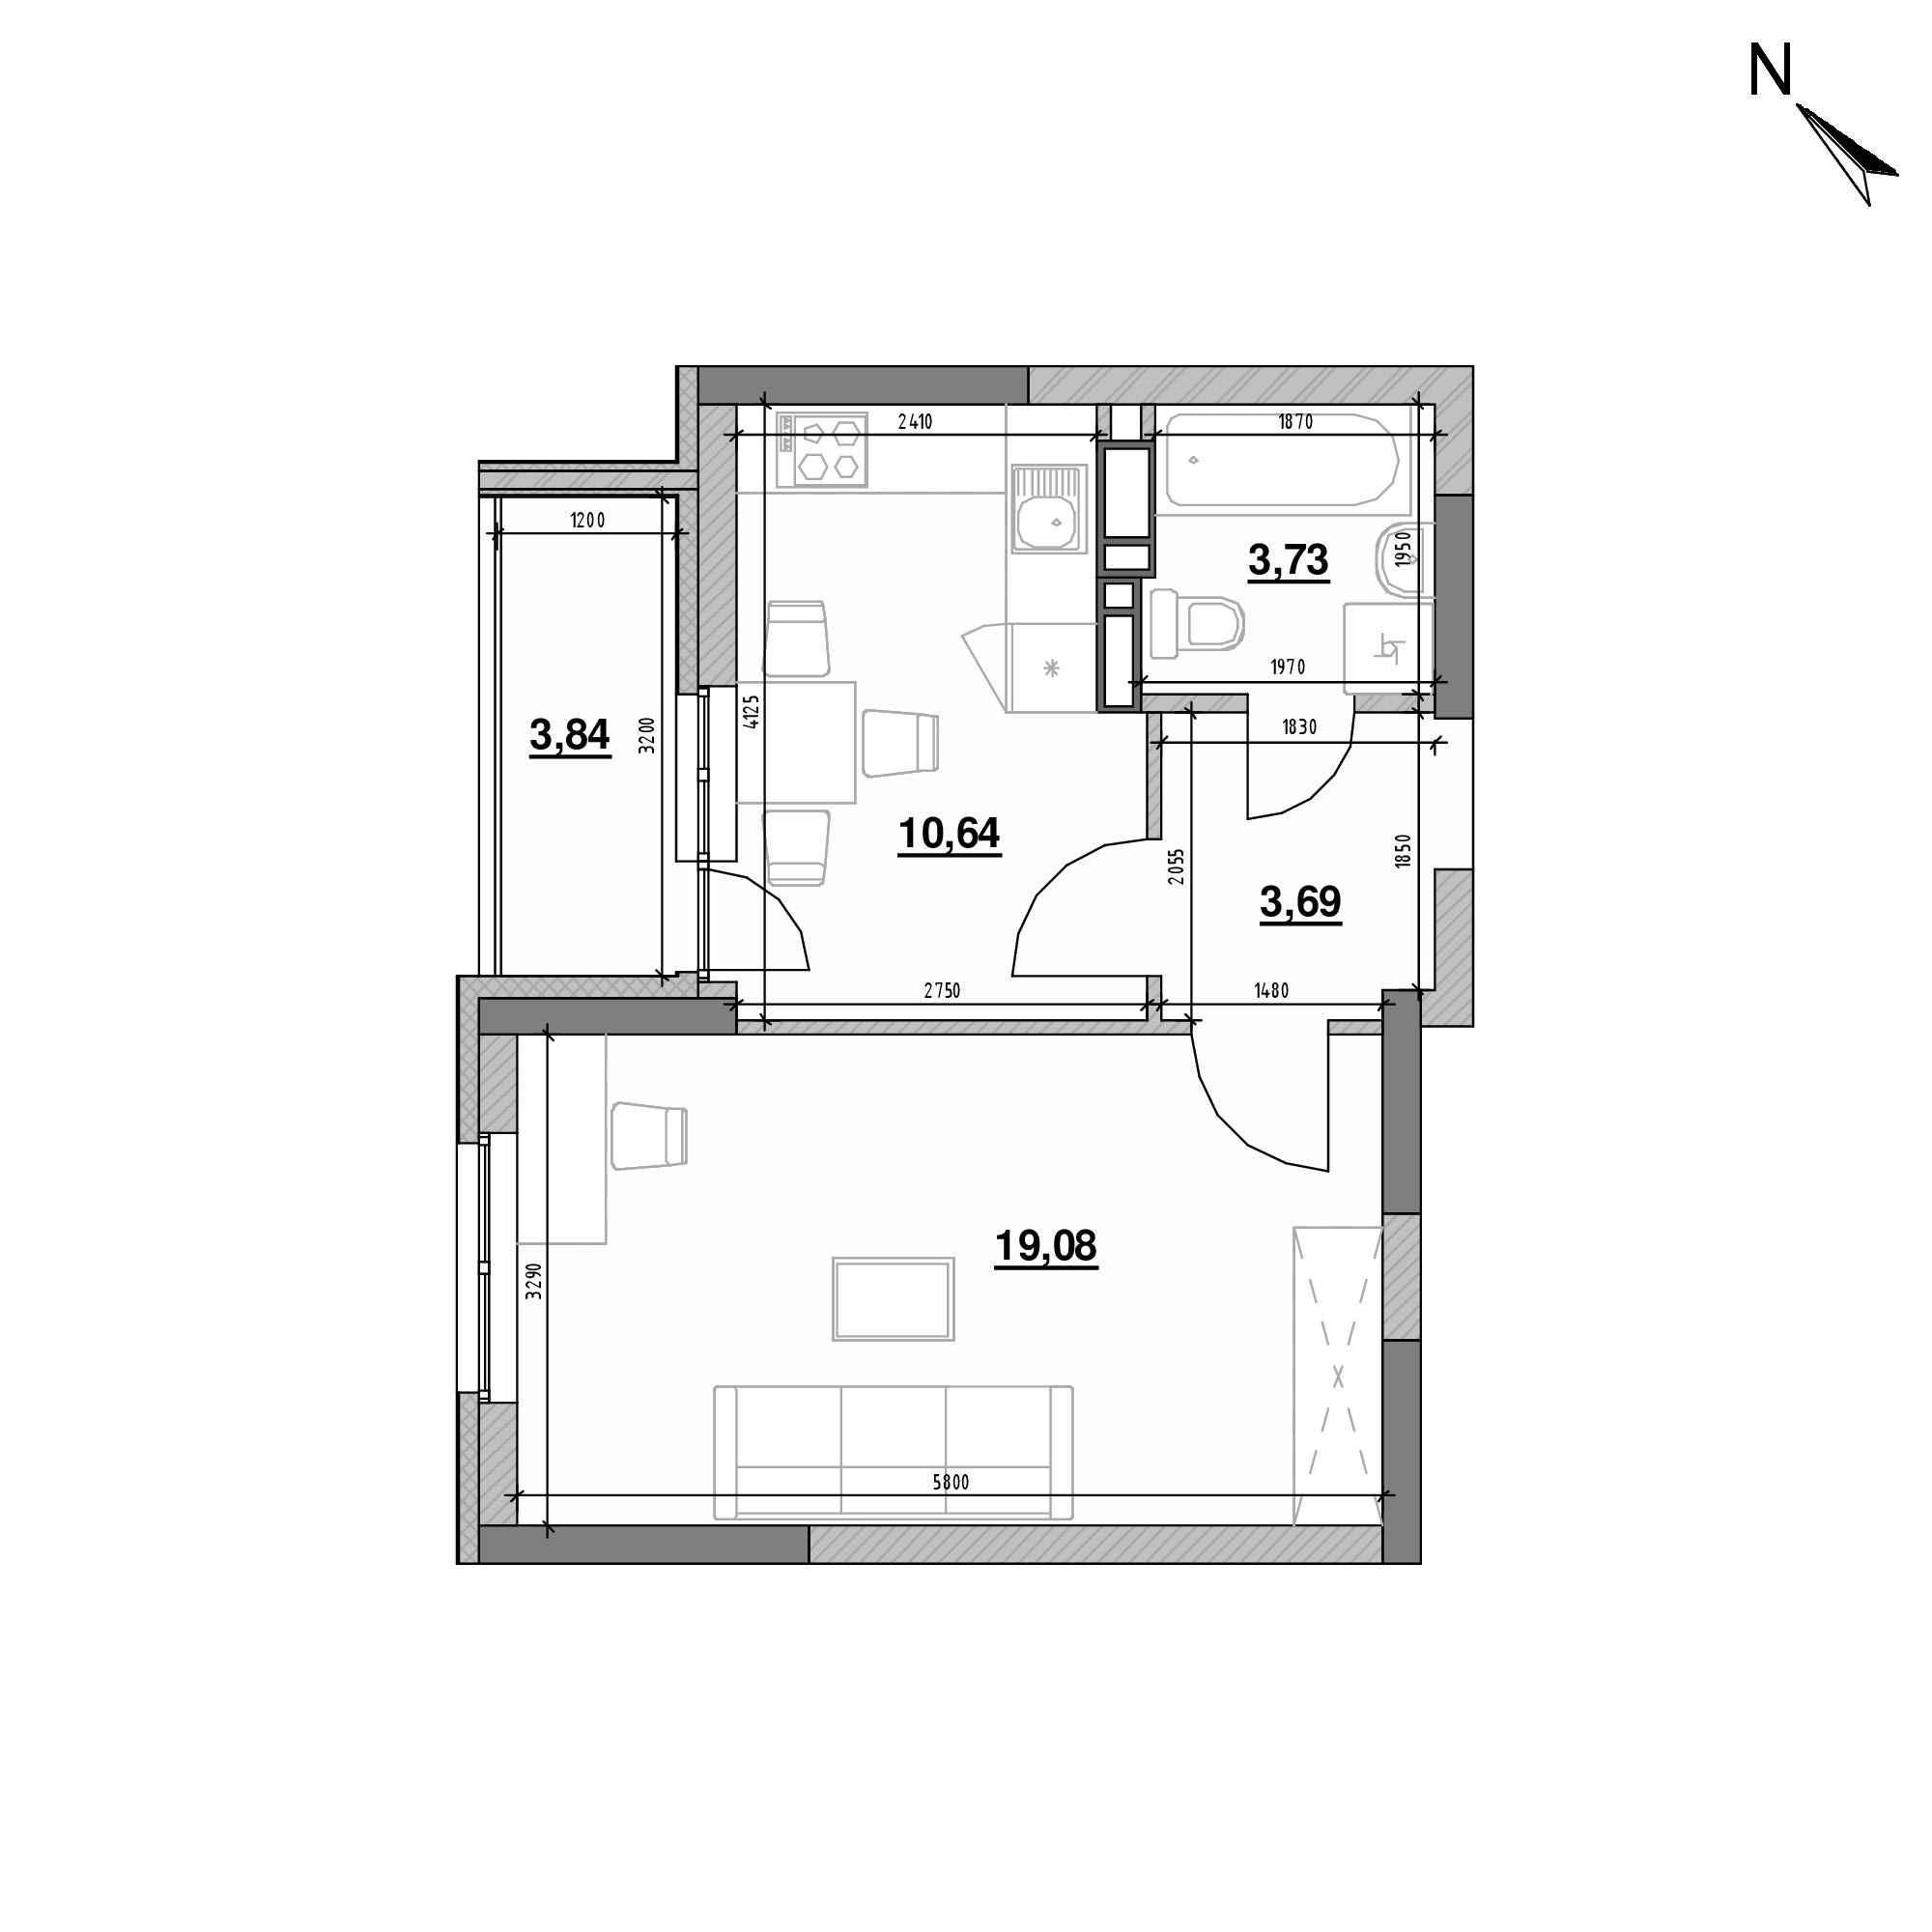 ЖК Оk'Land: планування 1-кімнатної квартири, №213, 40.98 м<sup>2</sup>